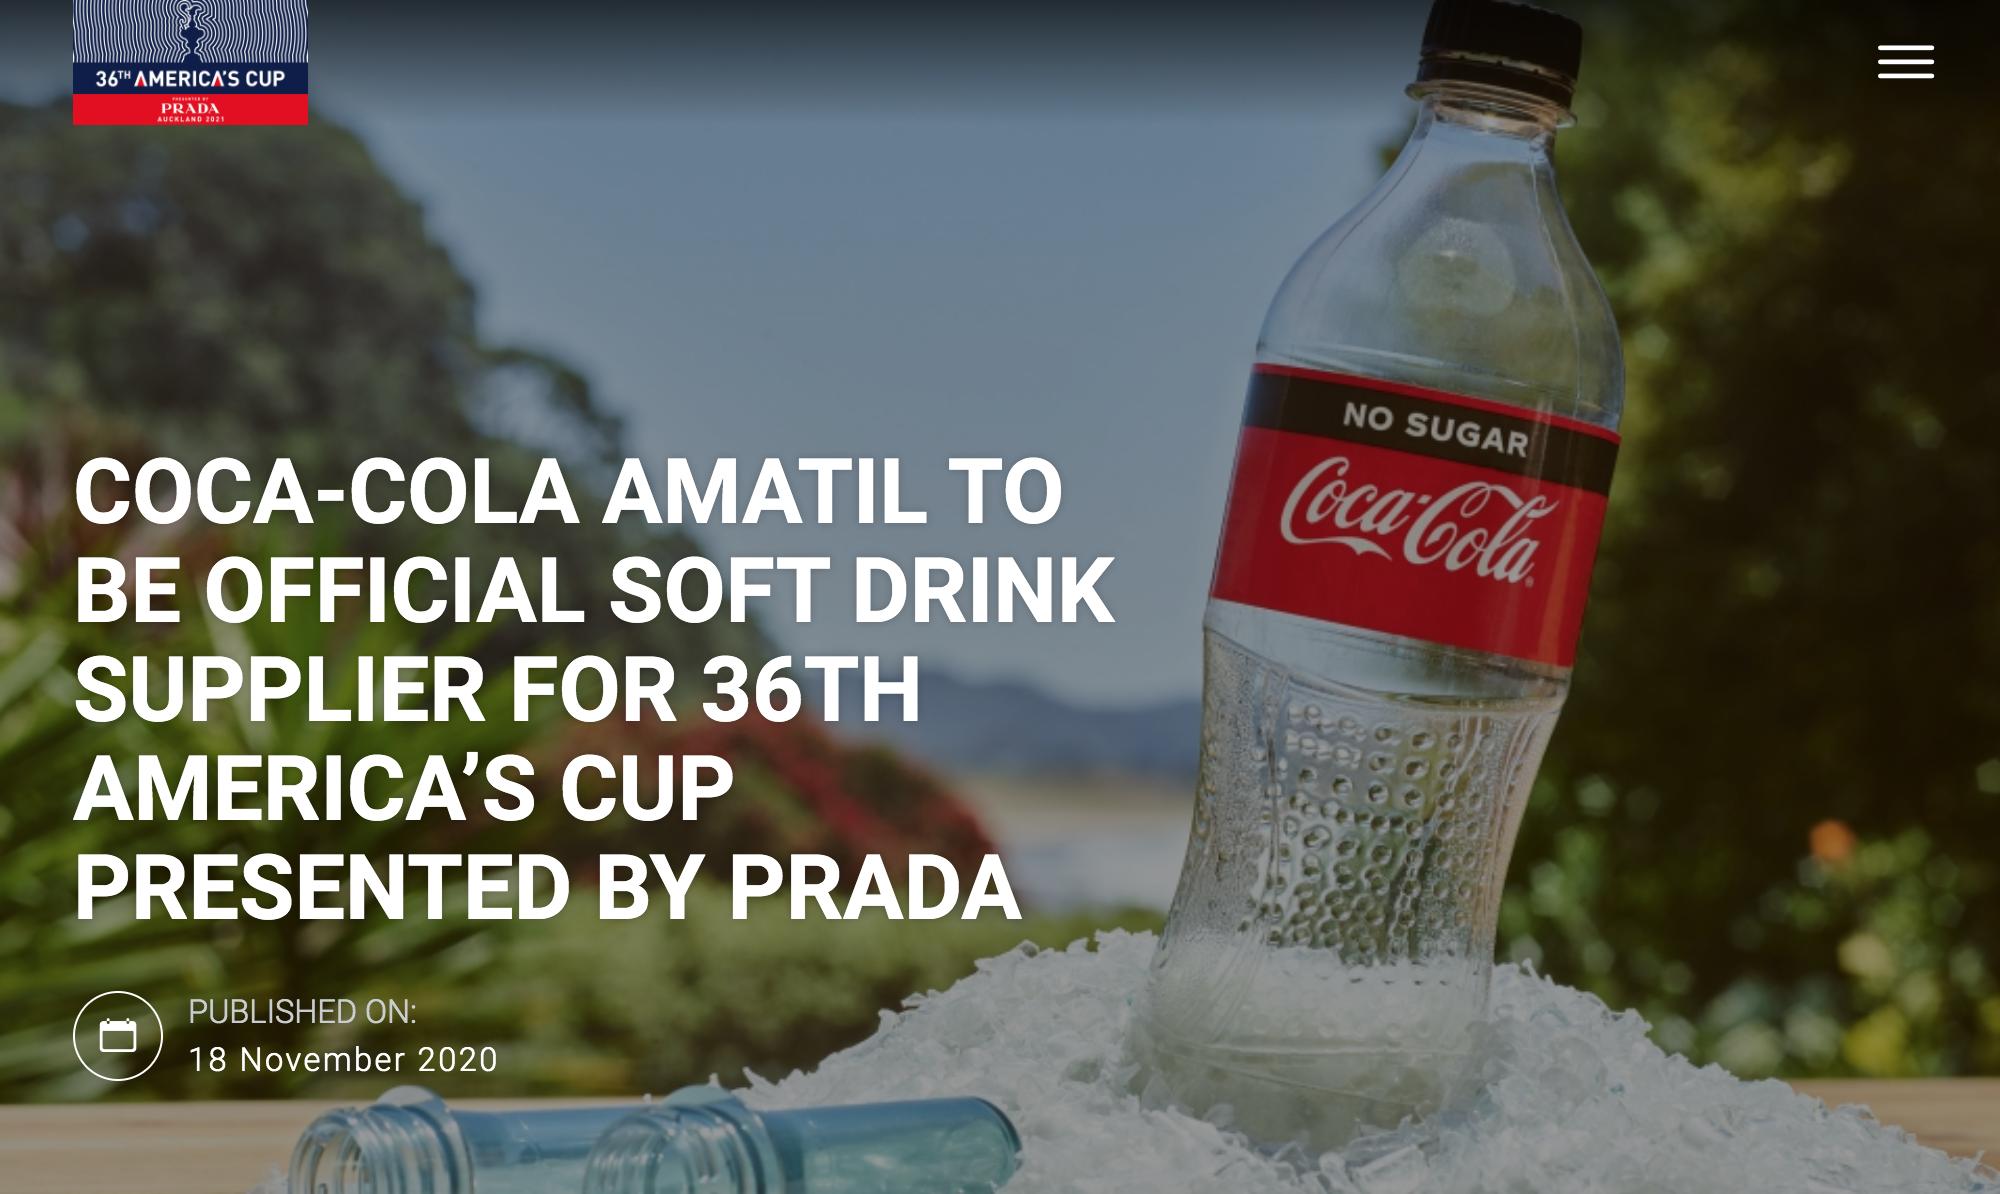 America's Cup News - Coca Cola Official Sponsor